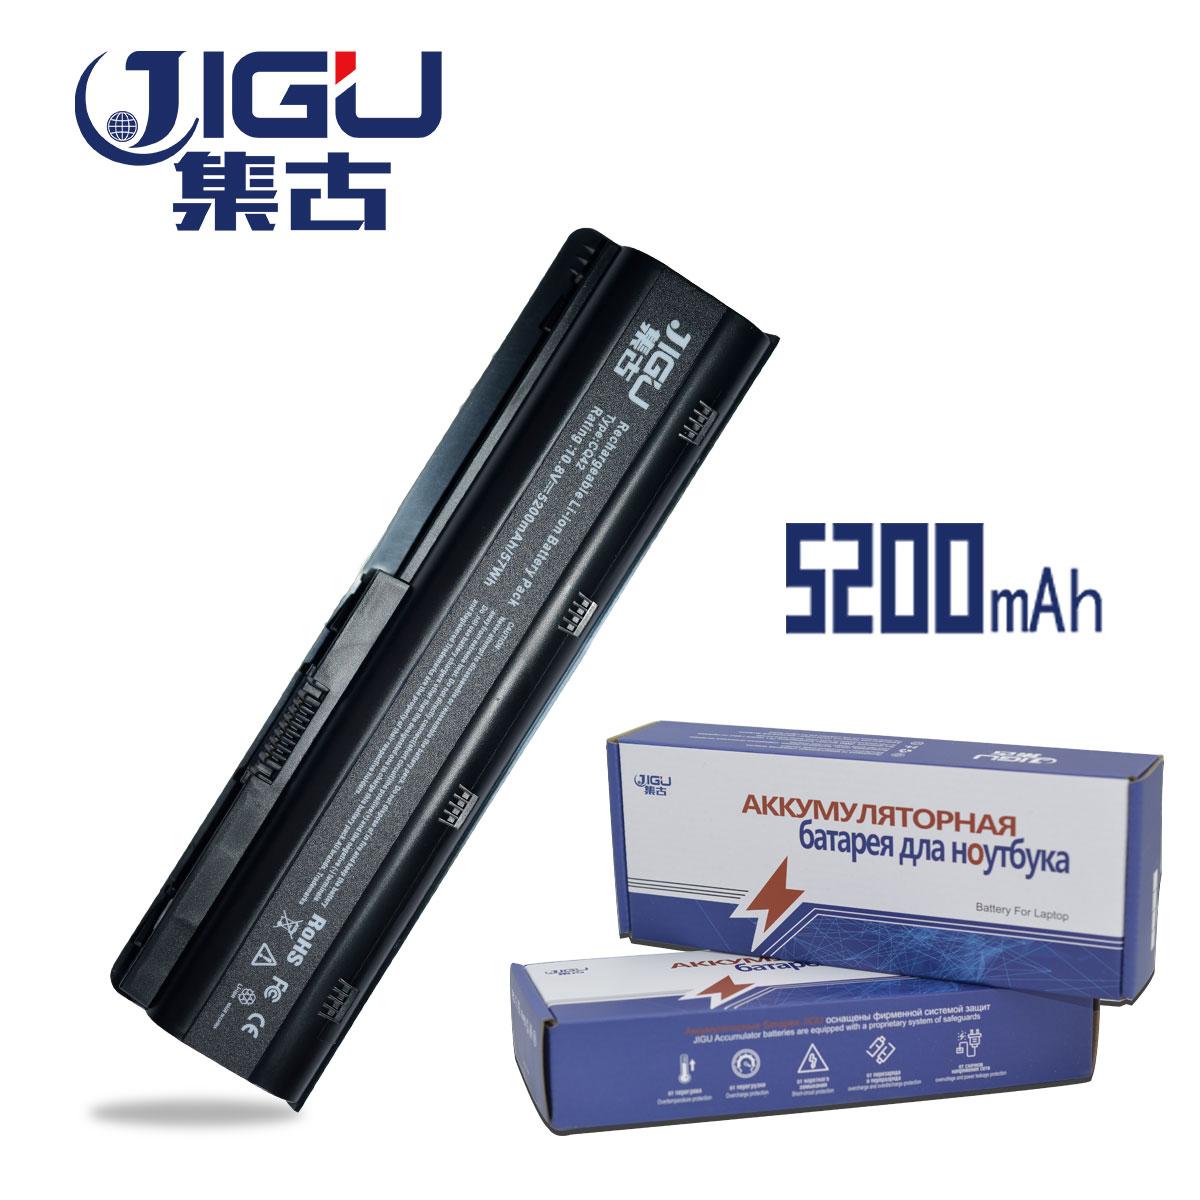 JIGU Battery For HP Pavilion DM4 DM4T DV3 DV7 G4 G6 G7 G62 G62T G72 MU06 HSTNN-UBOW Presario CQ42 CQ56 CQ62